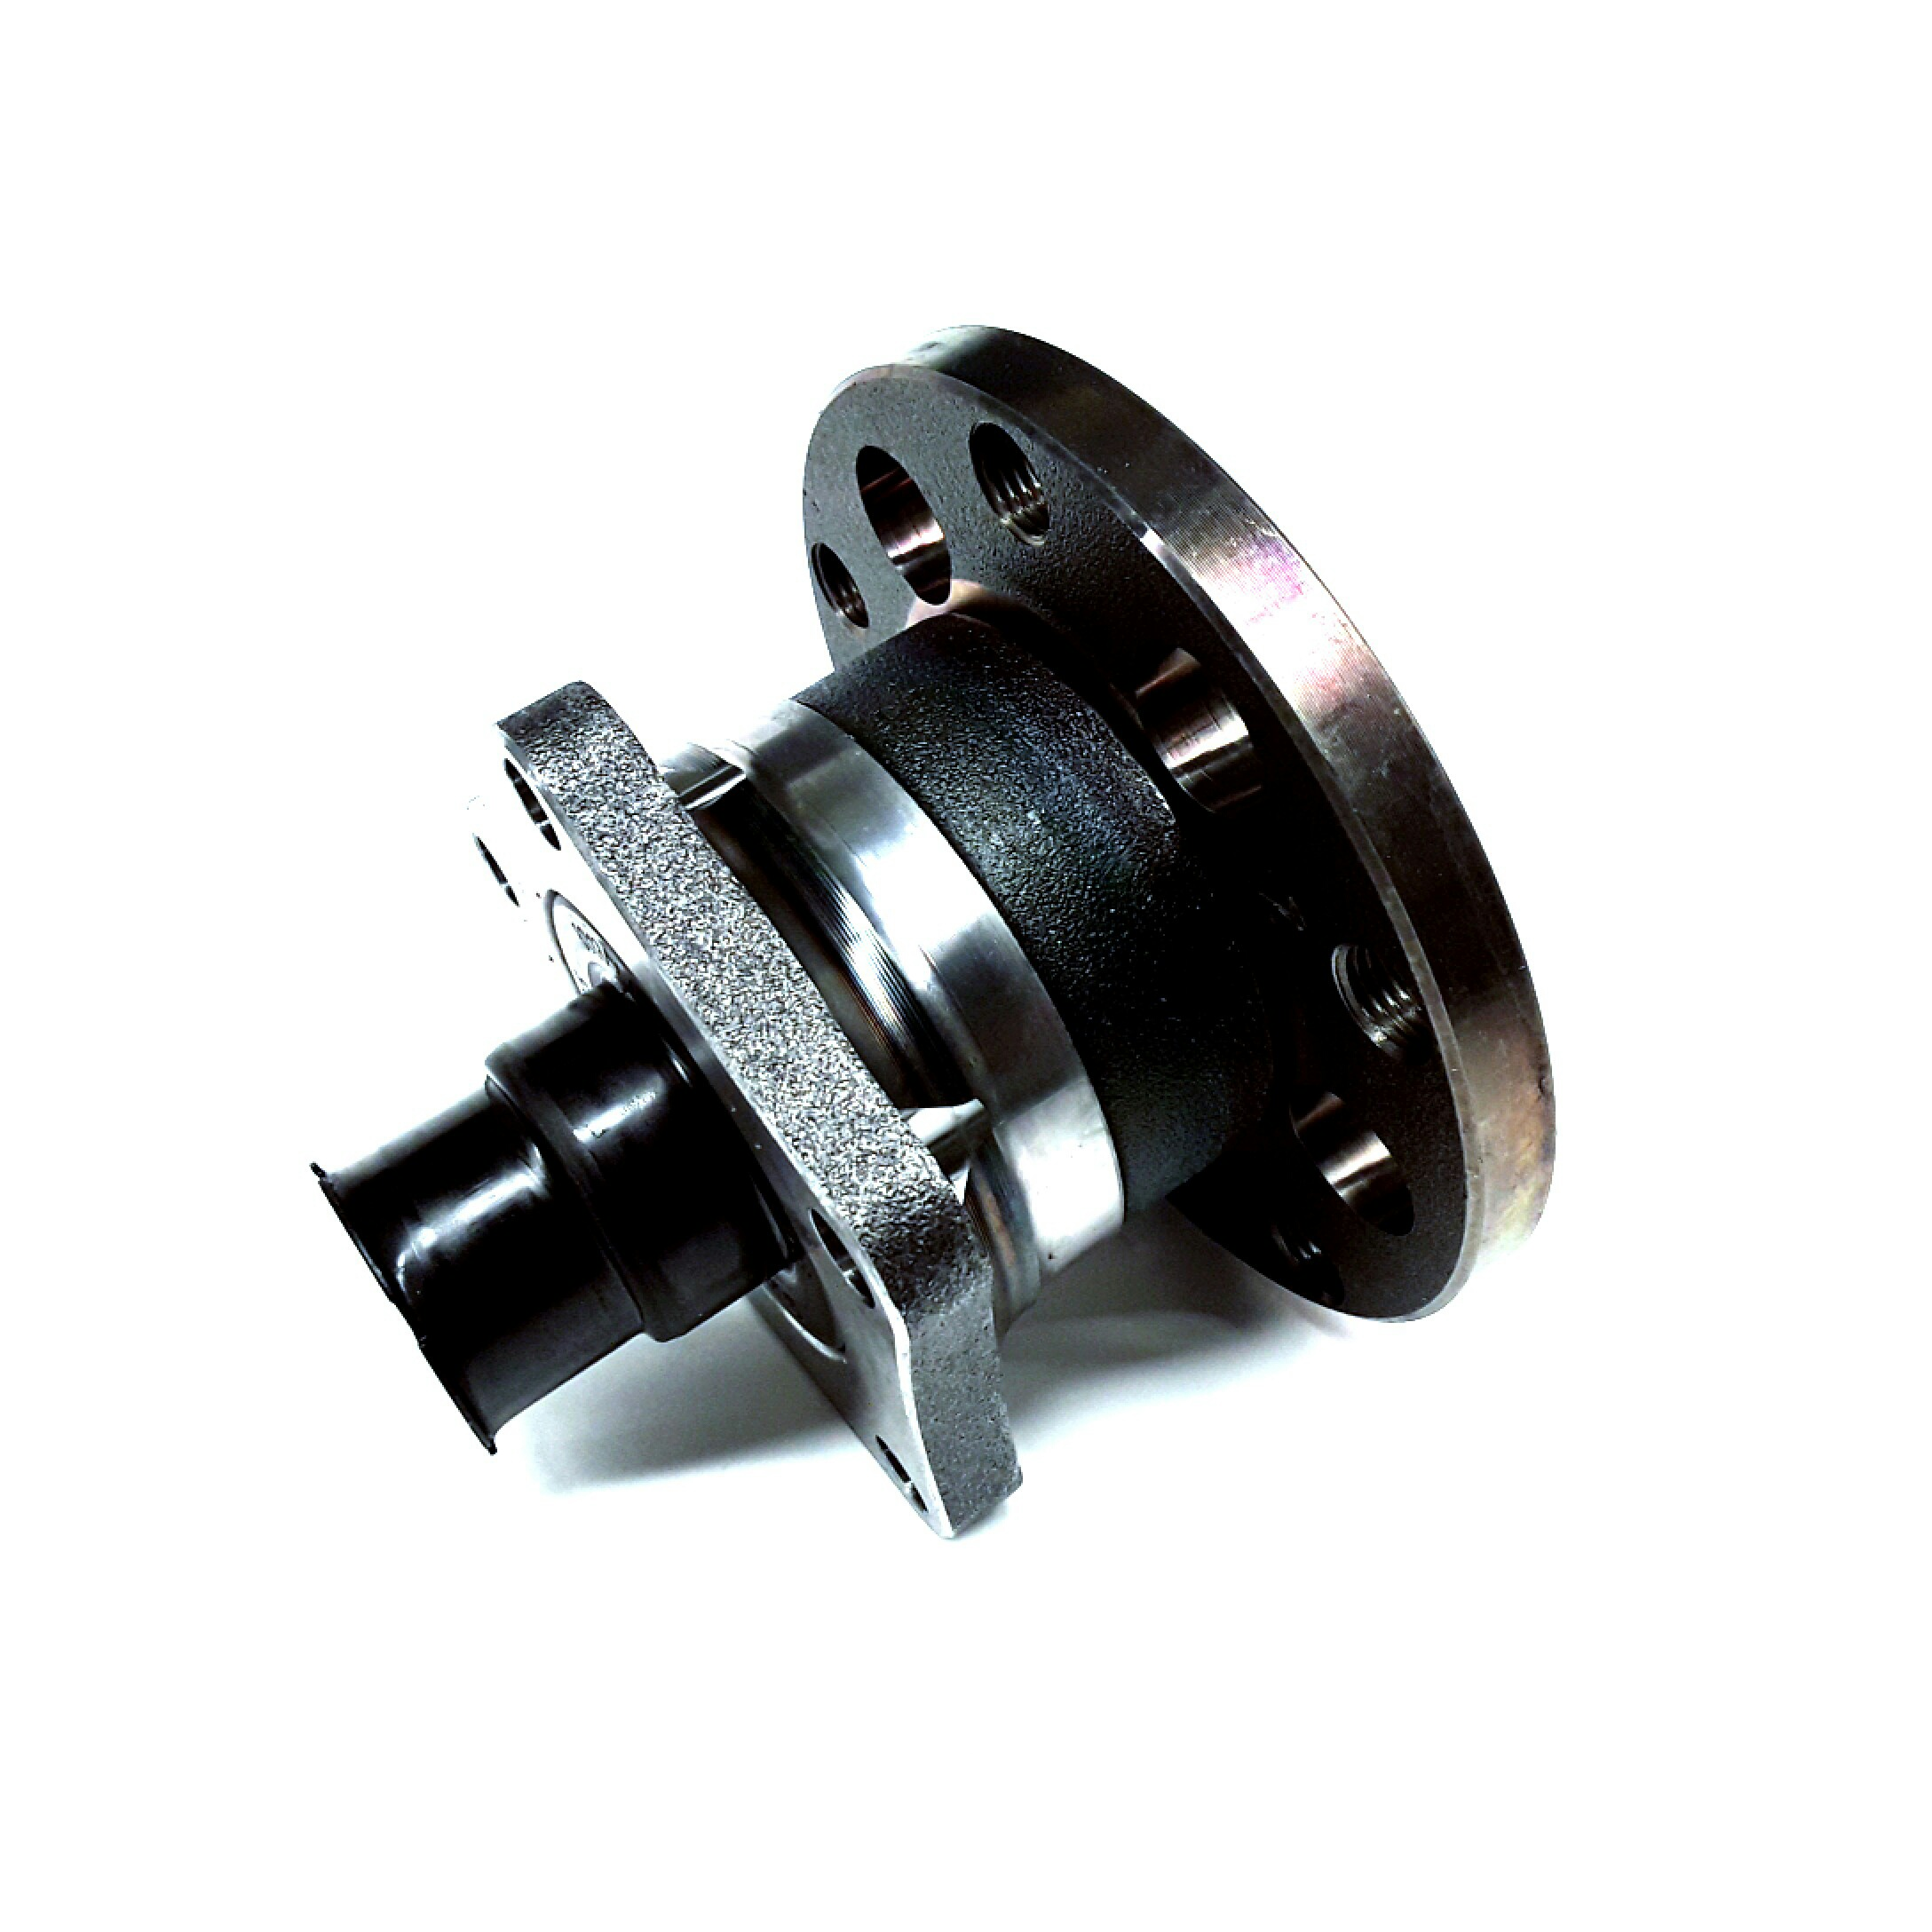 Buggy Wheel Hub : Volkswagen passat wagon hub bearing rear